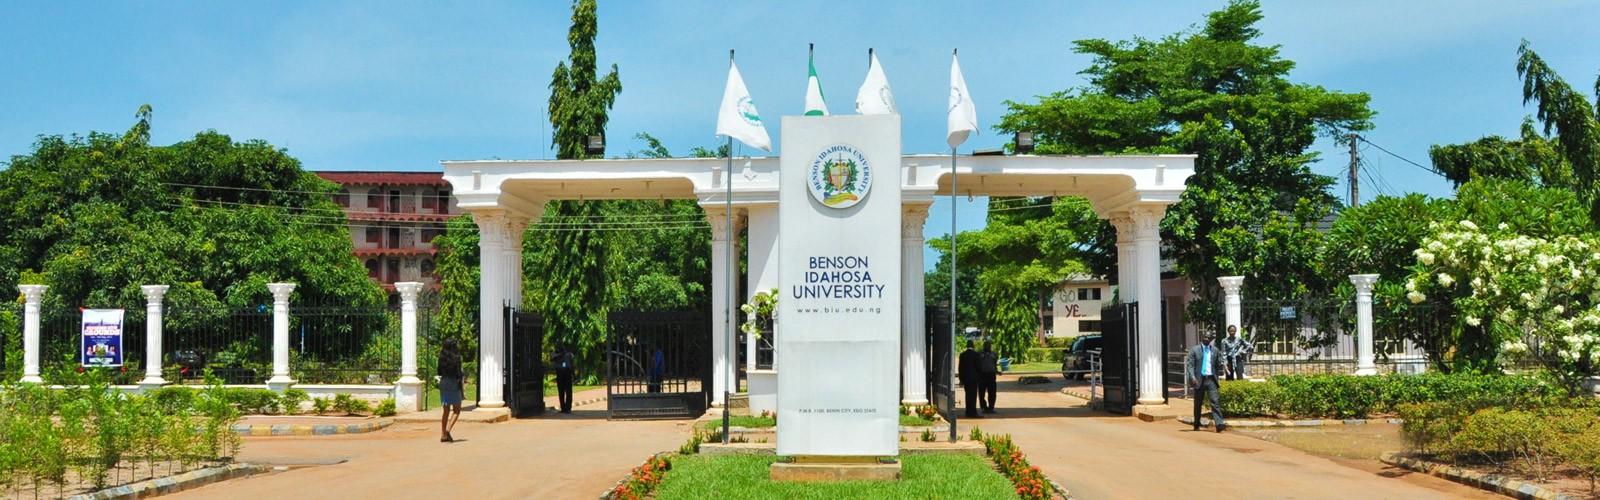 Benson Idahosa University Academic & Non-academic Job Recruitment (6 Positions)